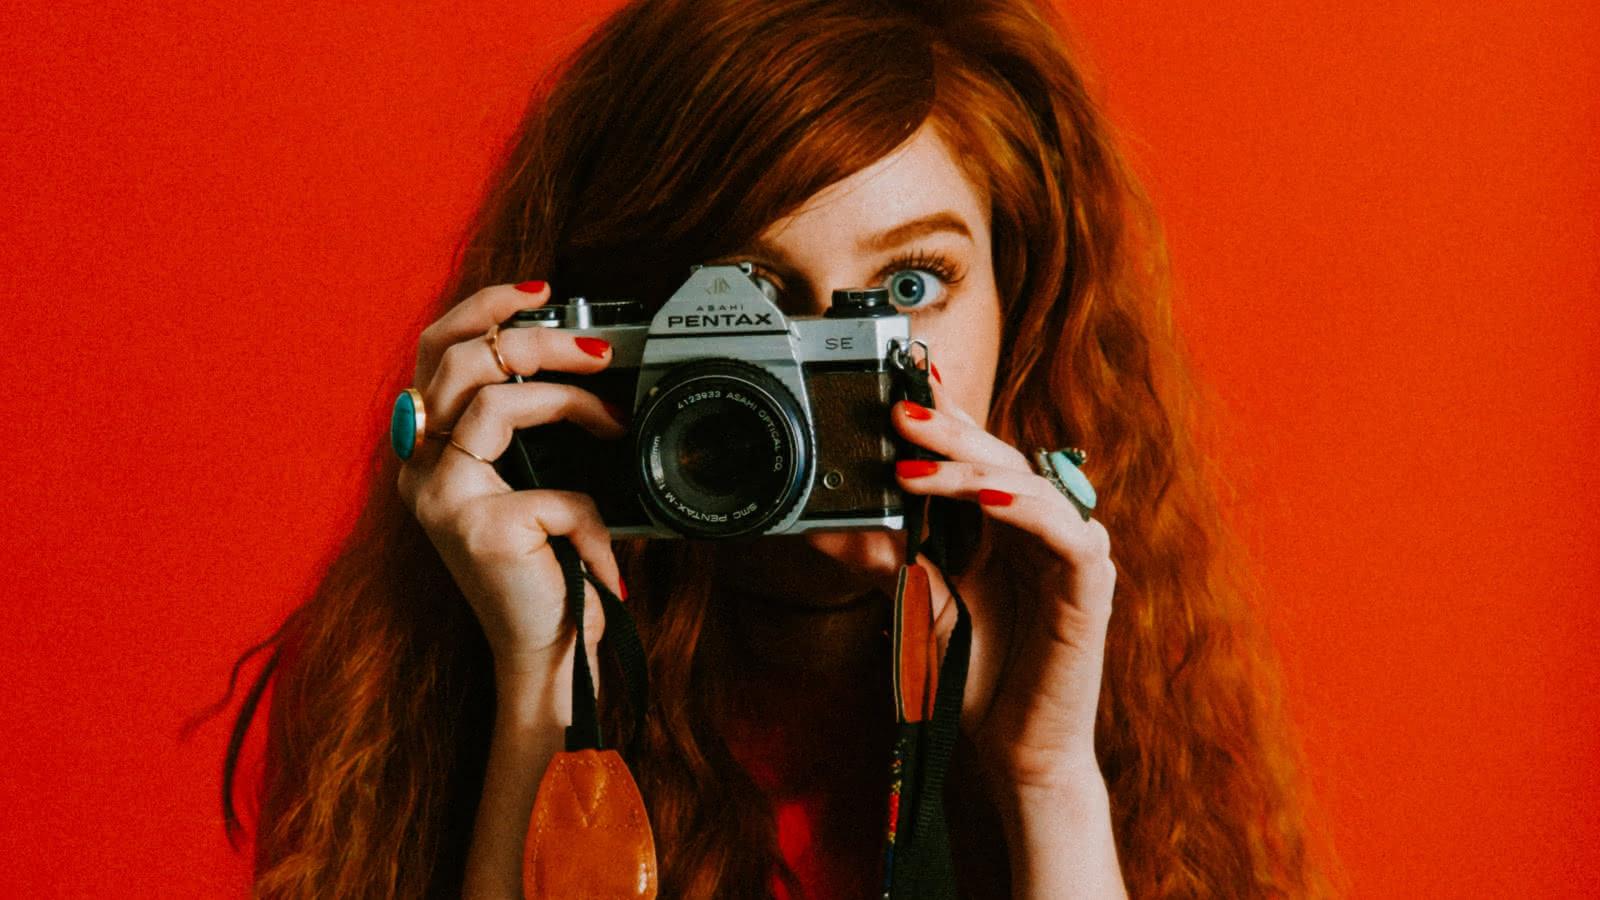 influencer blogger photograph